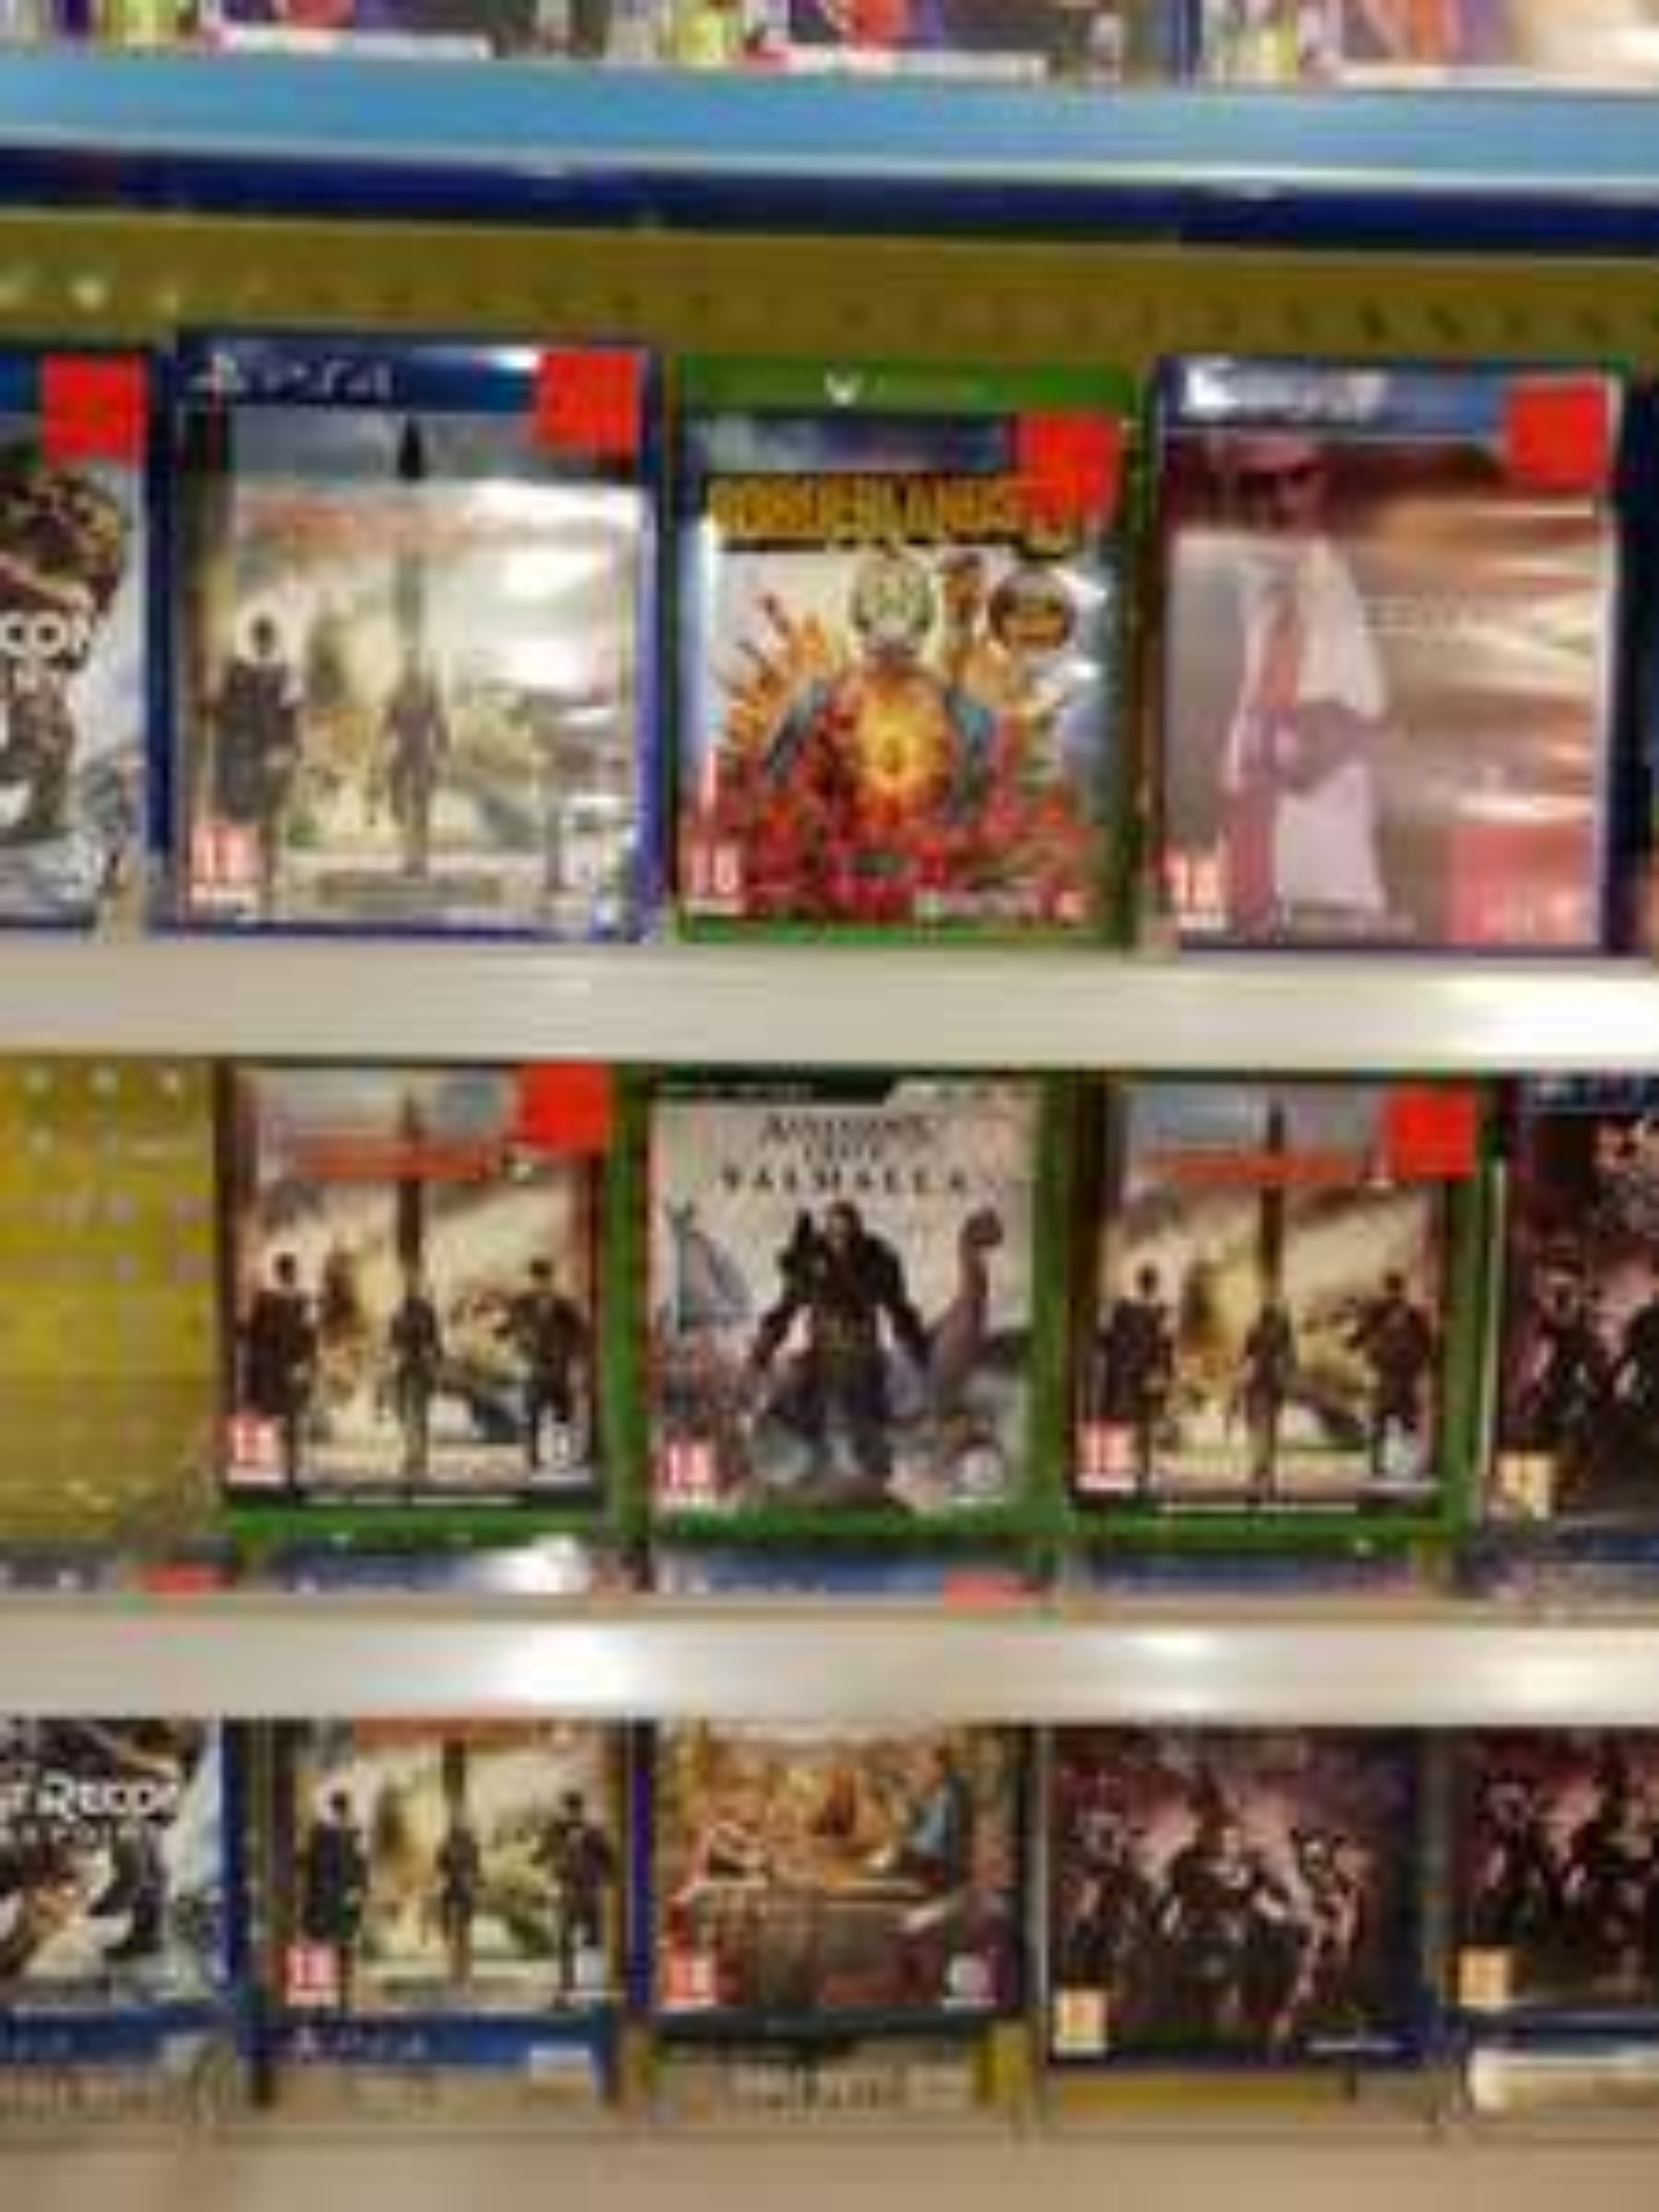 PS4 games bij Top1Toys, Heerhugowaard, wellicht landelijk (o.a. Hitman 2, The Division 2, Far Cry New Dawn, Ghost Recon: Breakpoint)